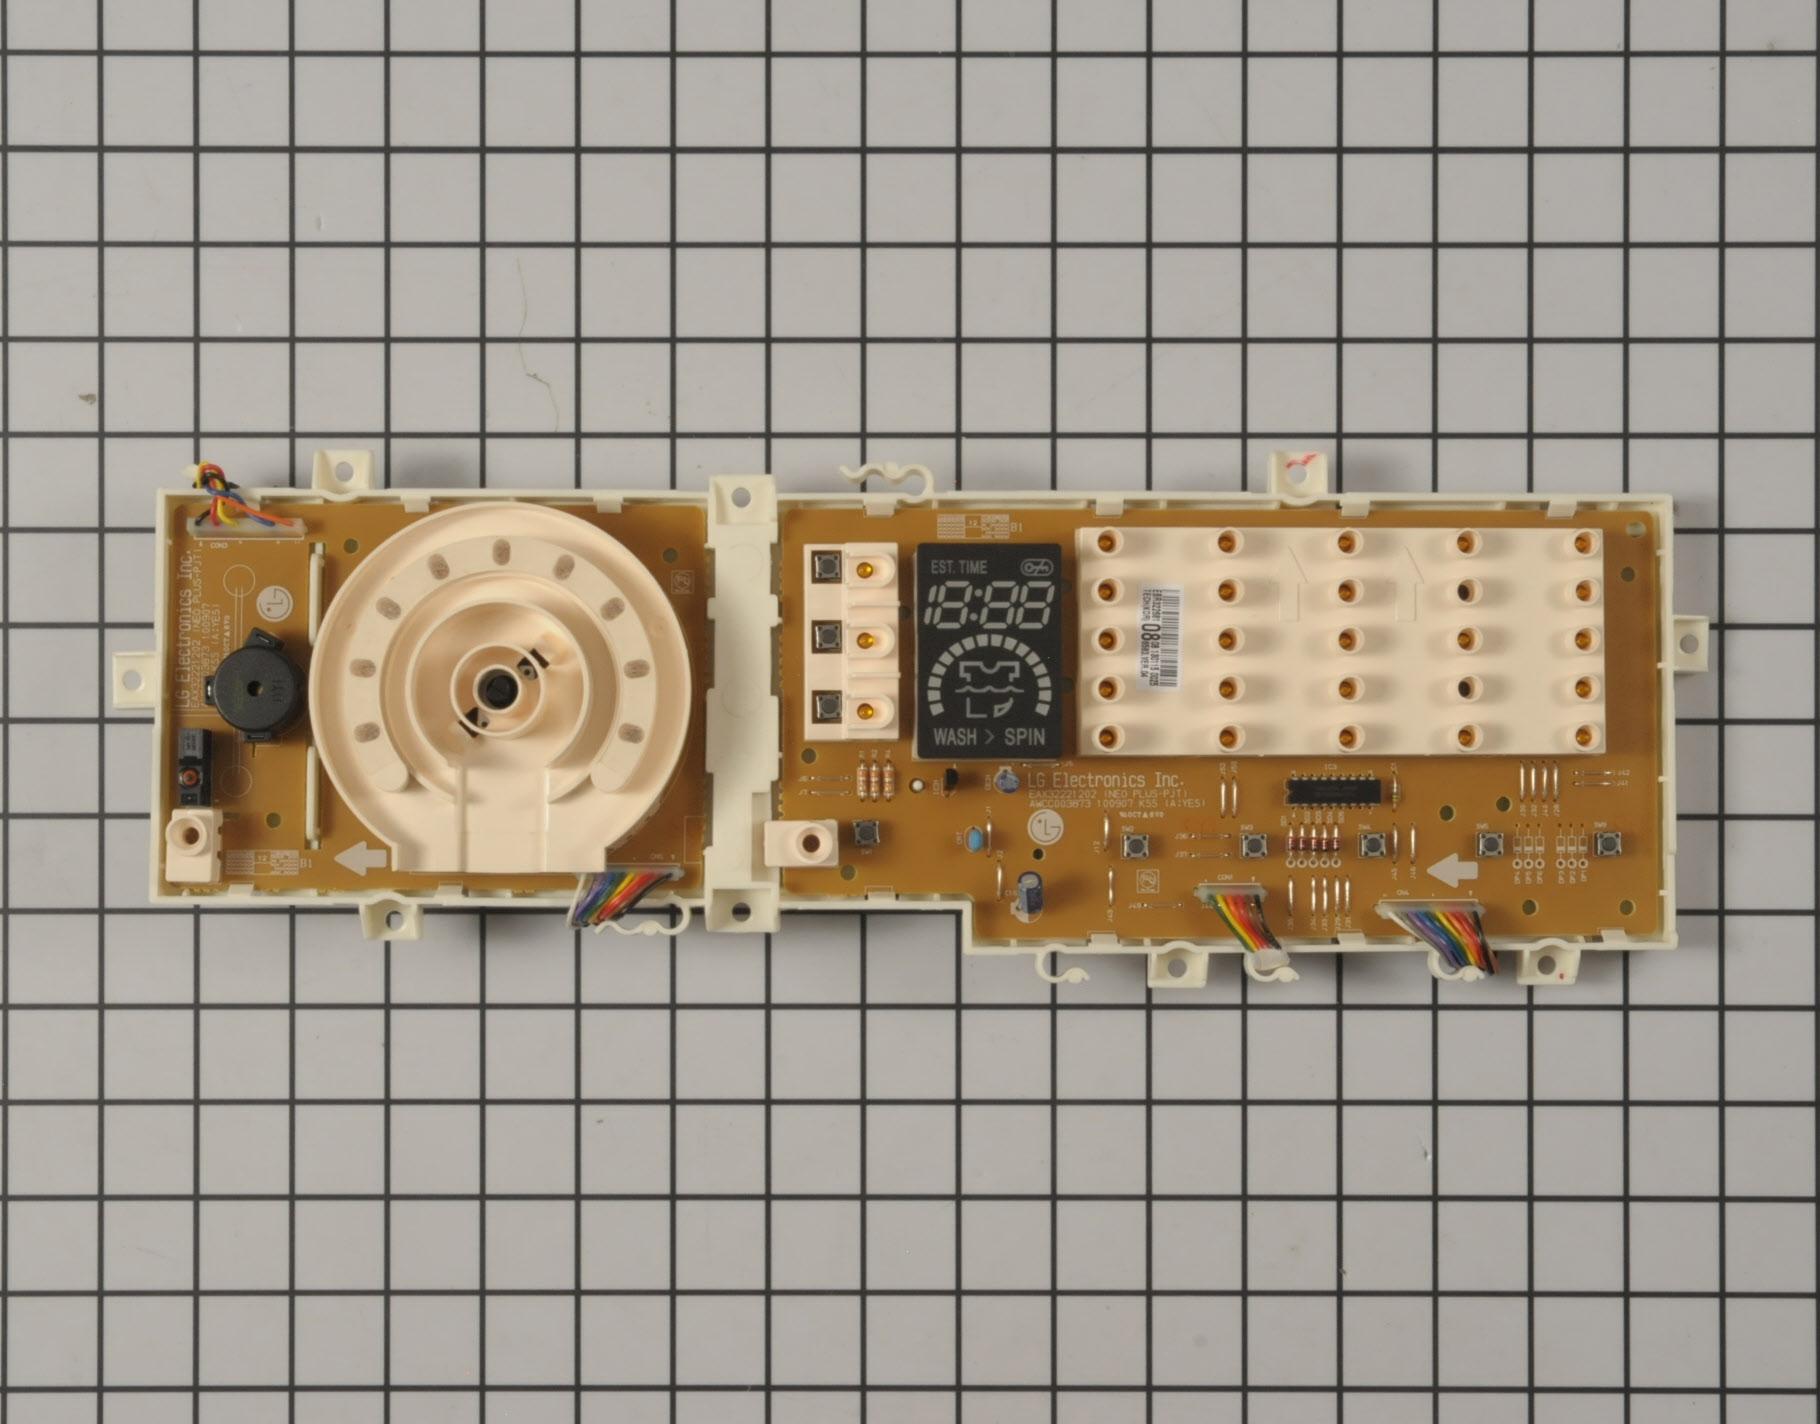 LG Washing Machine Part # EBR32268108 - User Control and Display Board